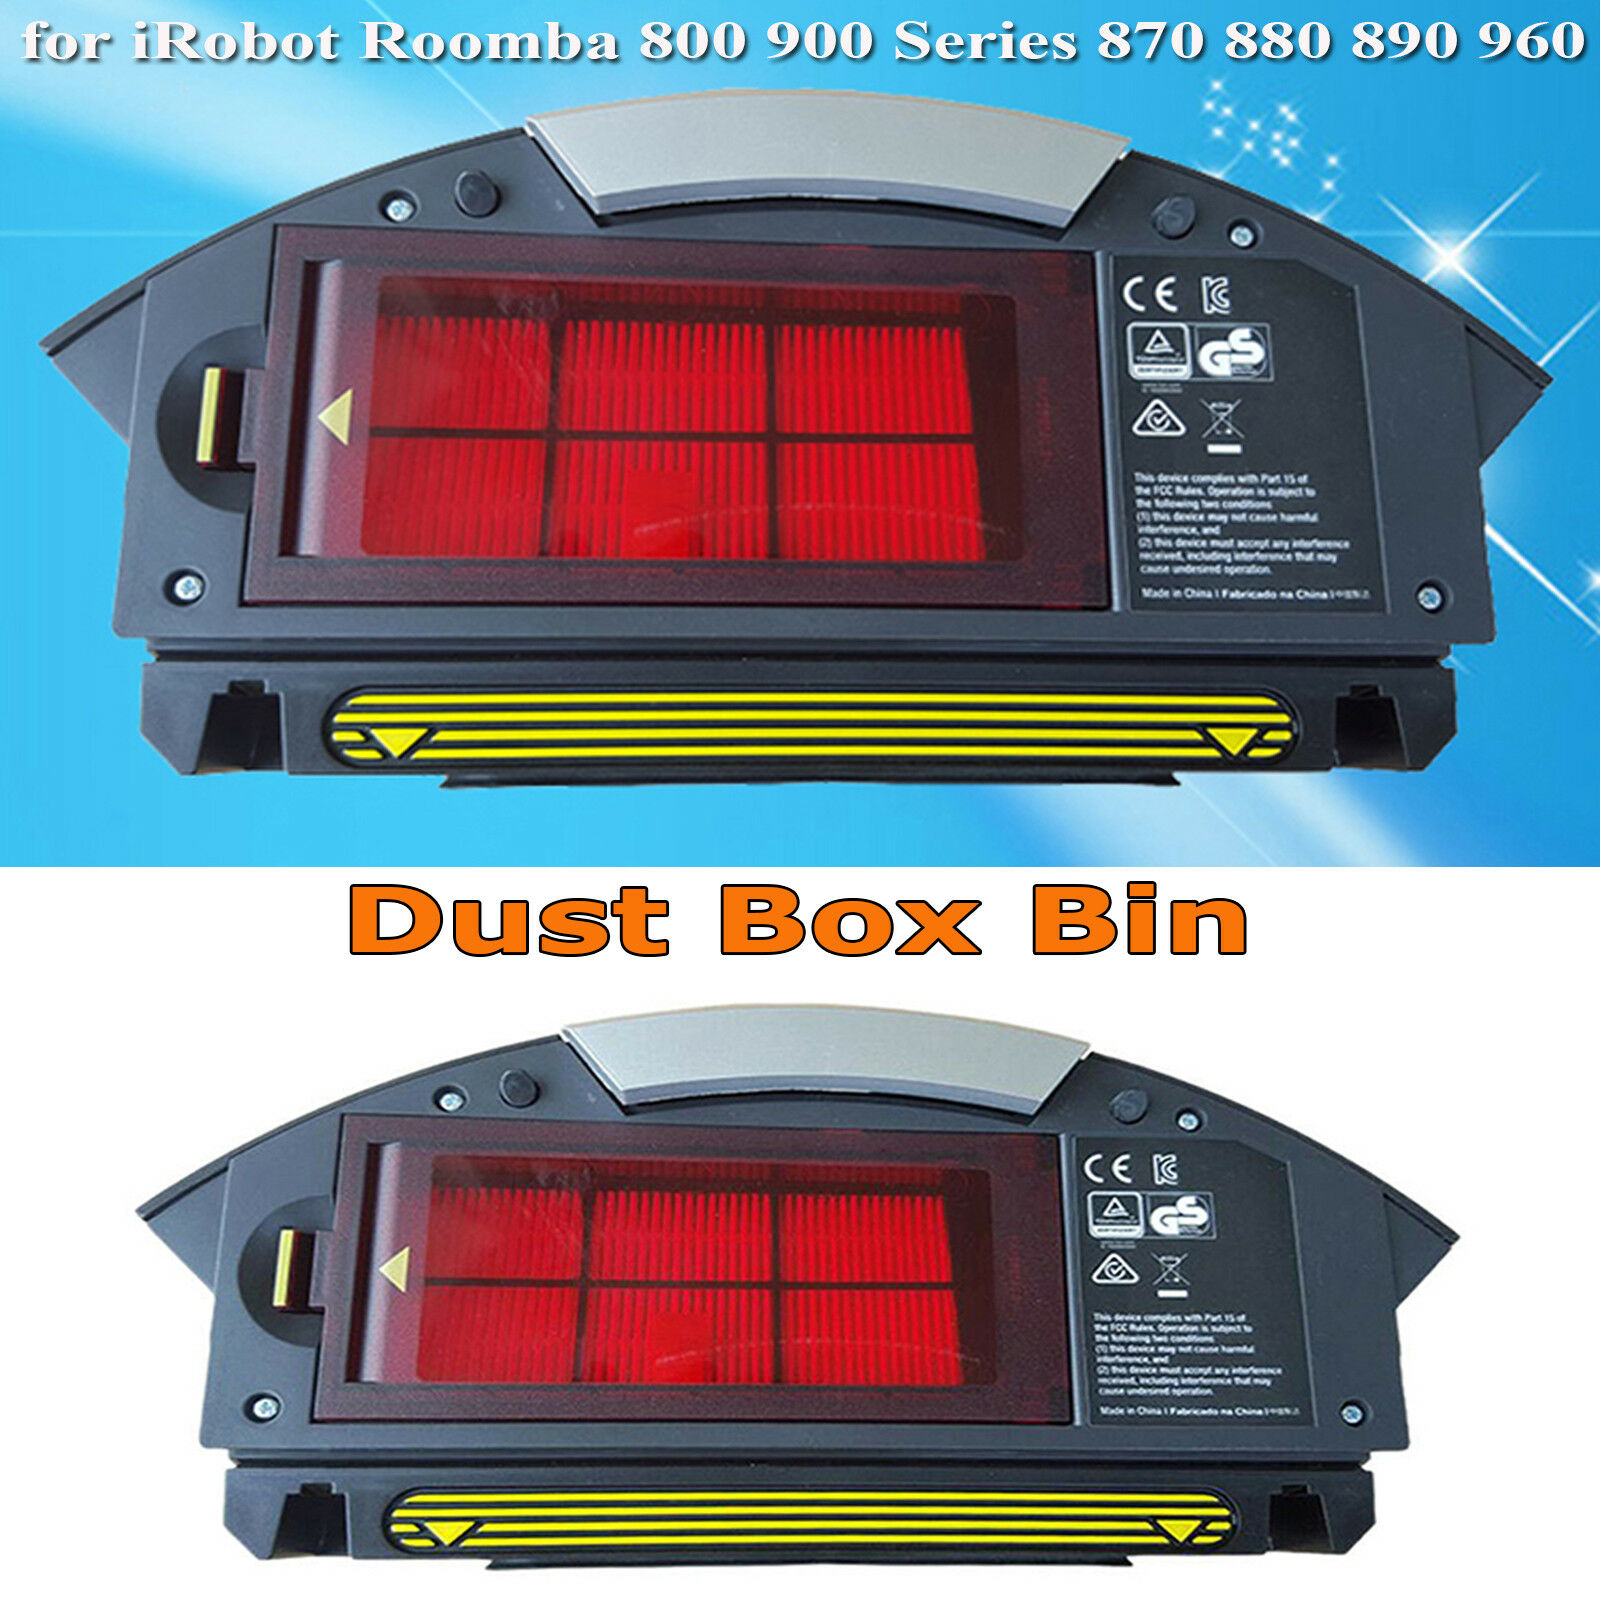 Dust Box Bin for iRobot Roomba 800 900 Series 870 880 960 980 Vacuum Cleaner